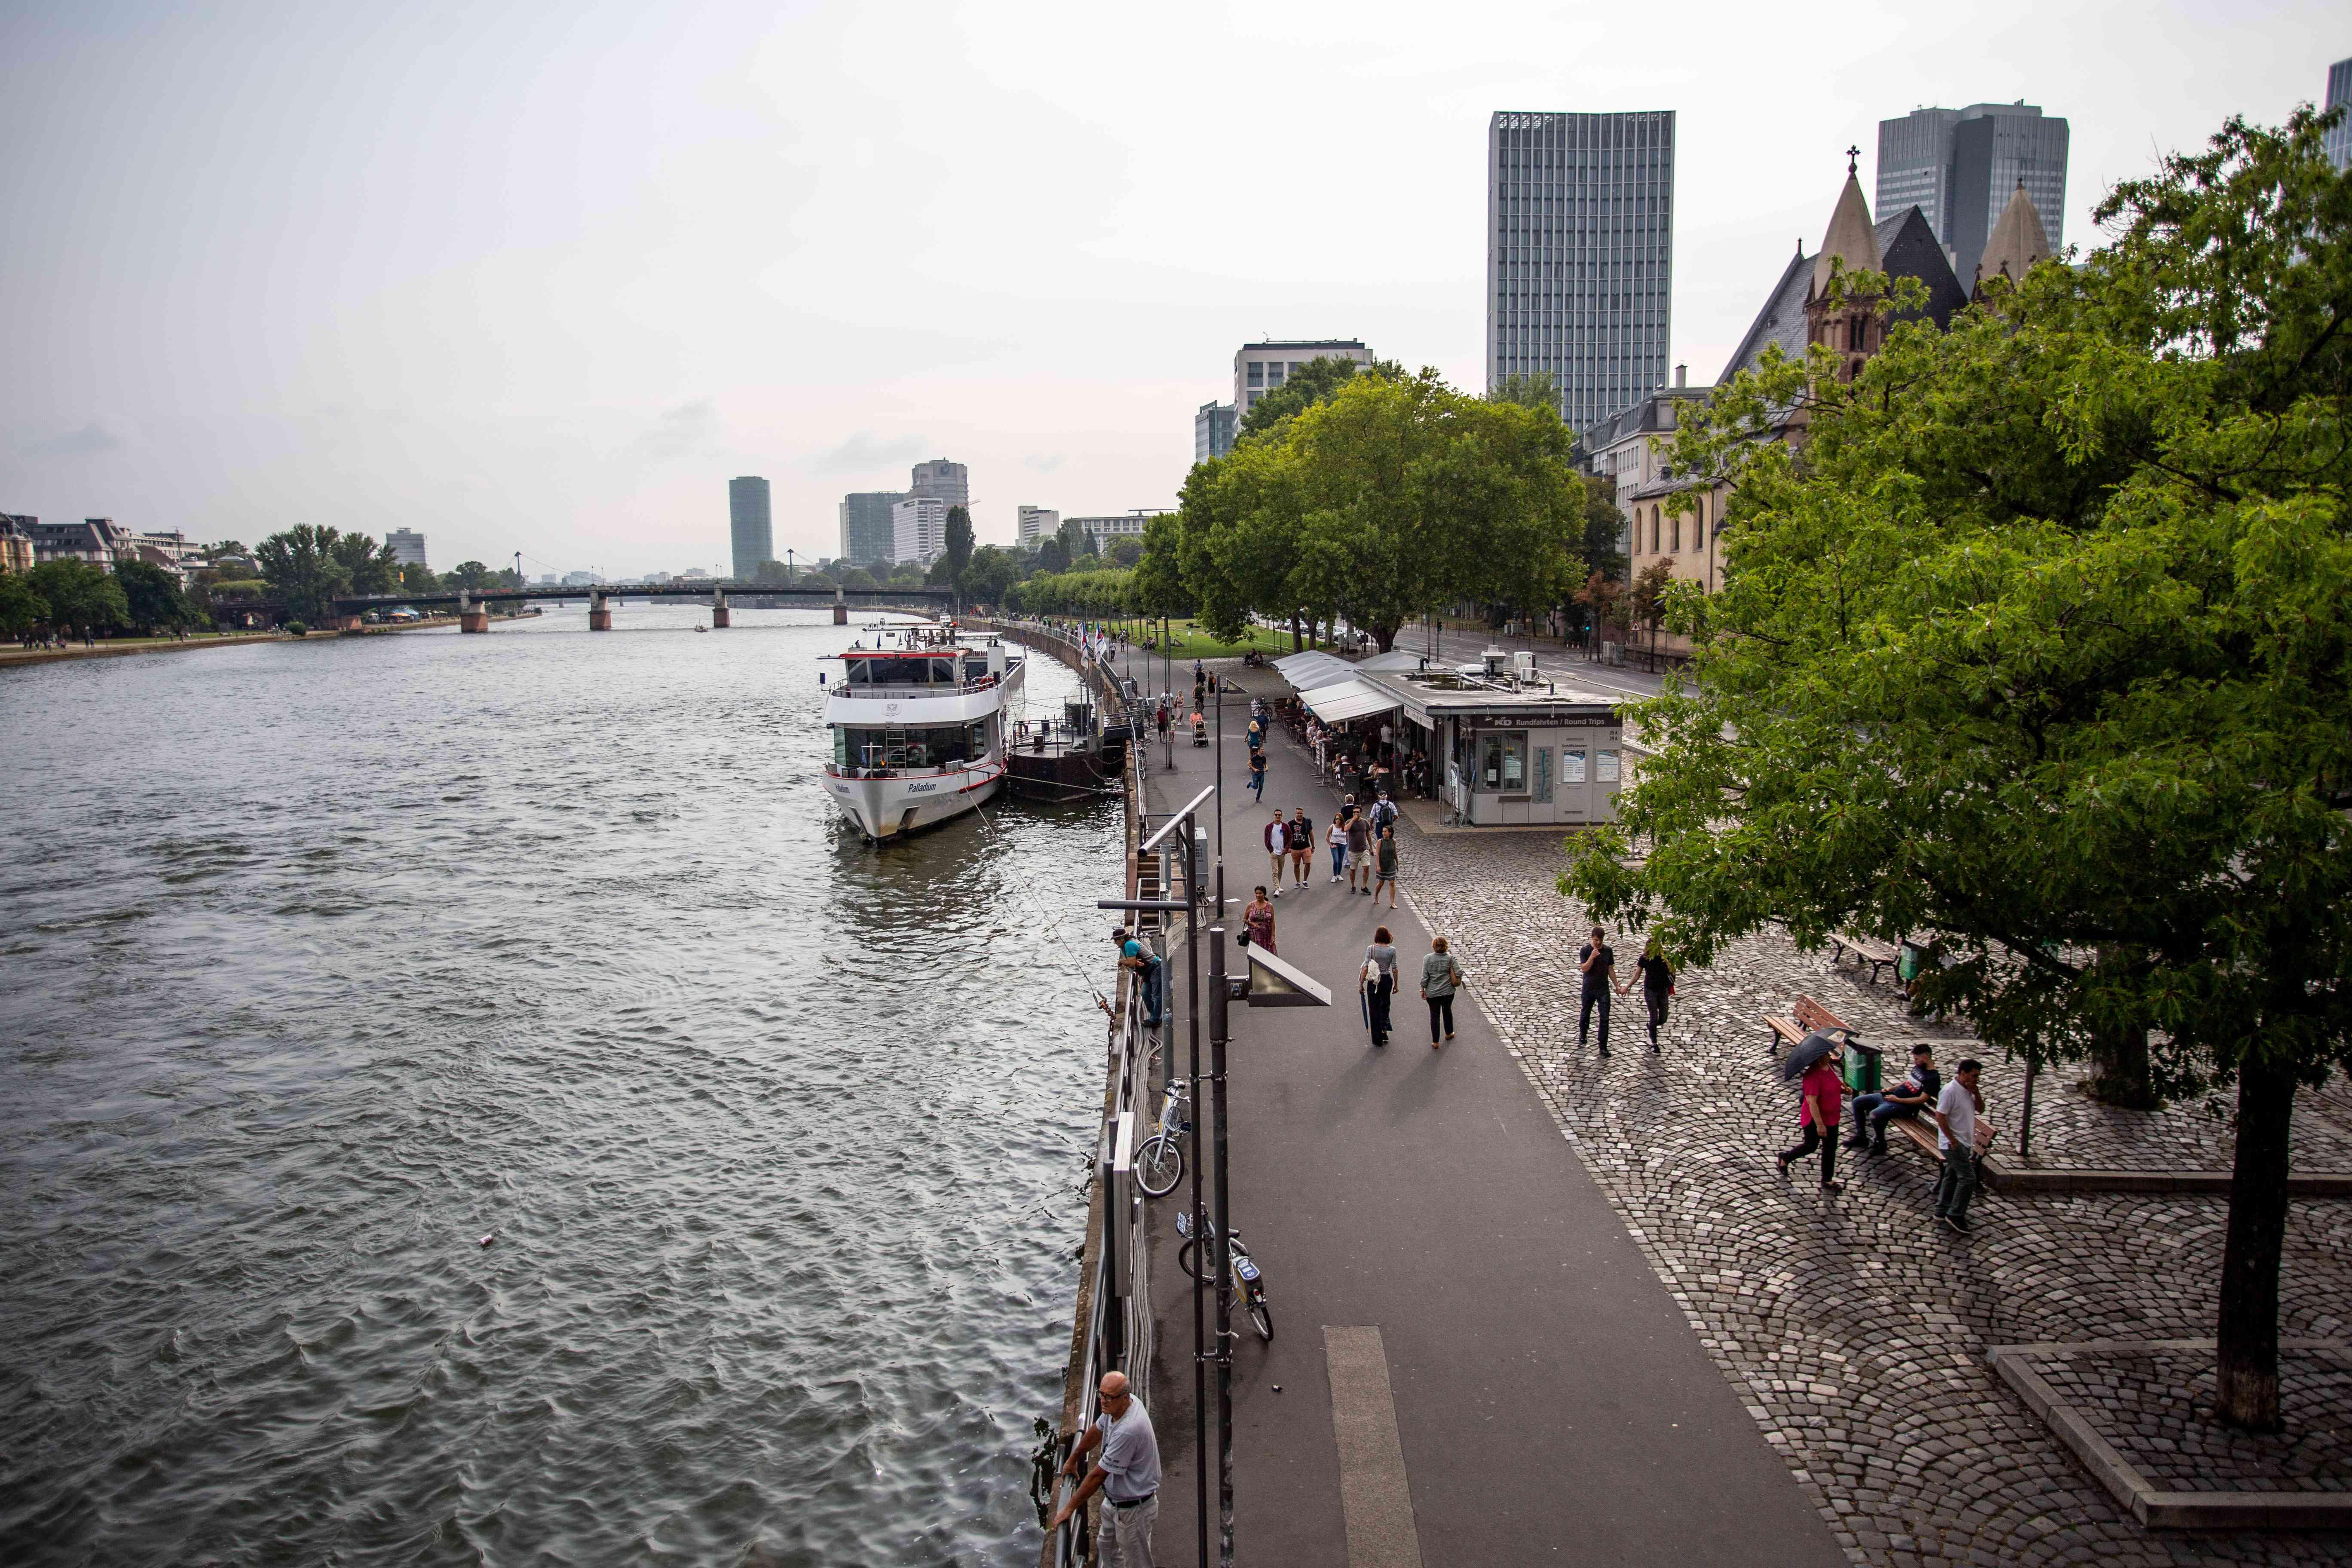 People walking along the river embankment